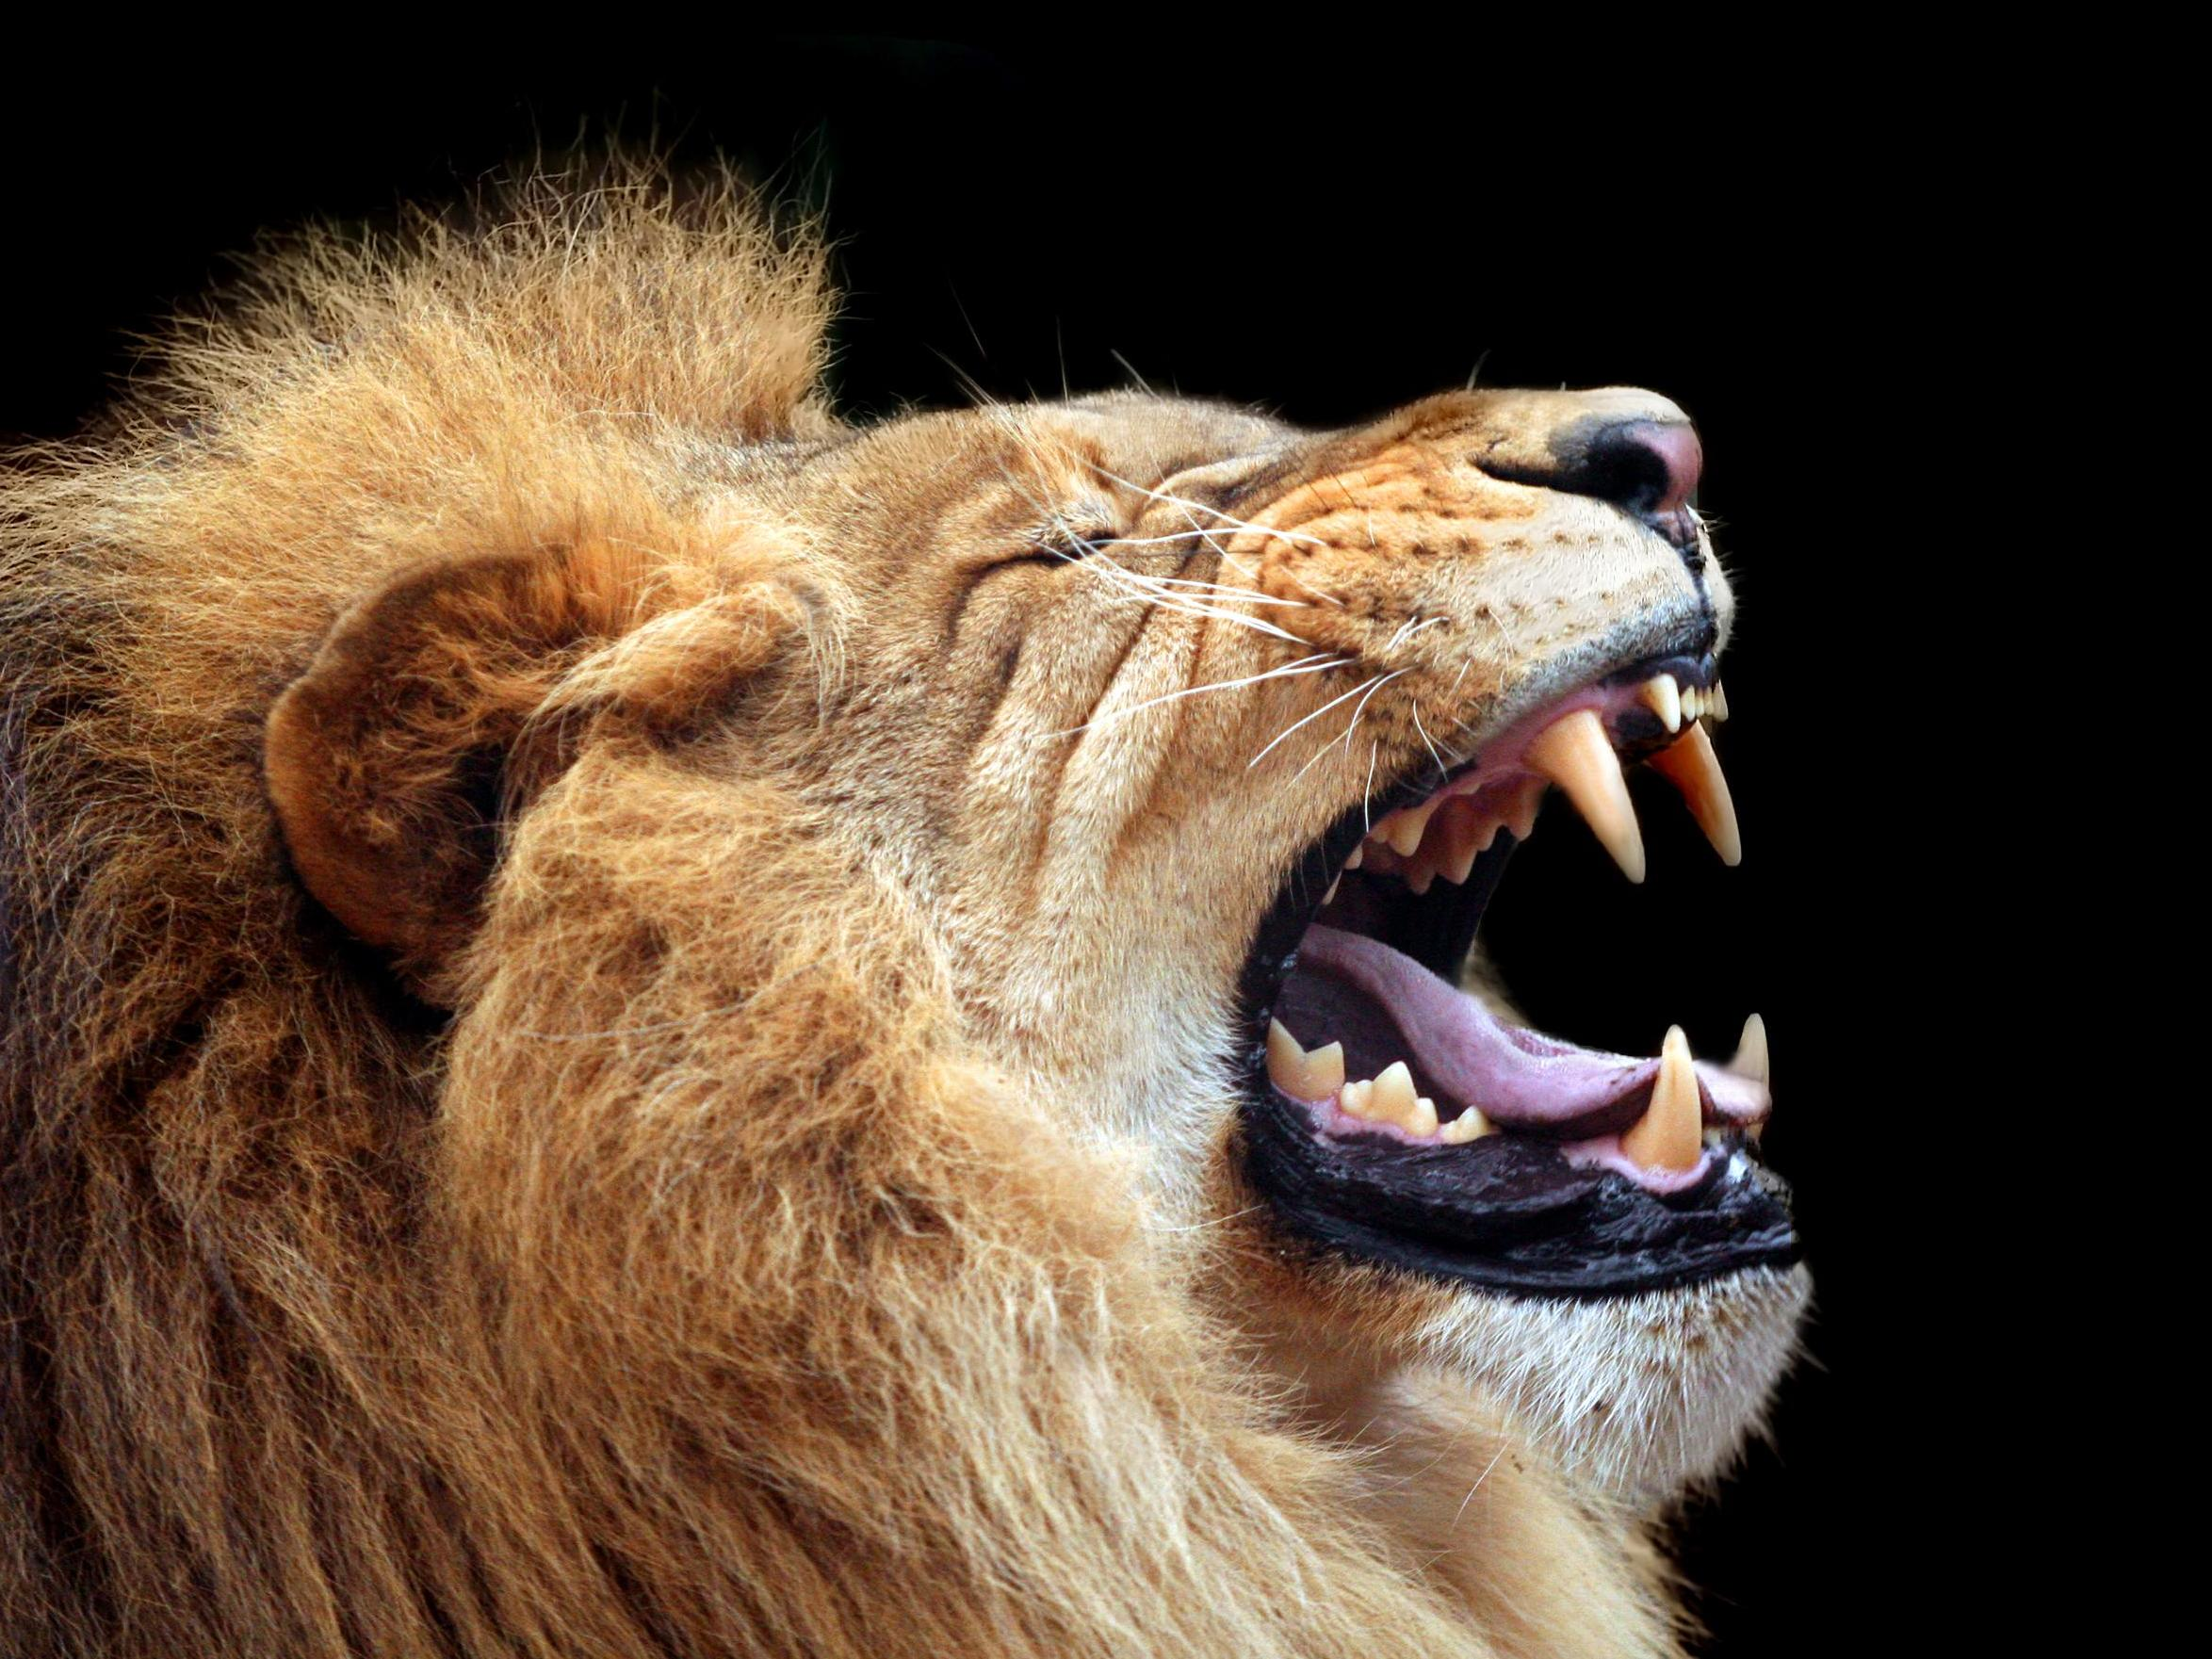 Man sets pet lion on electrician demanding payment for work